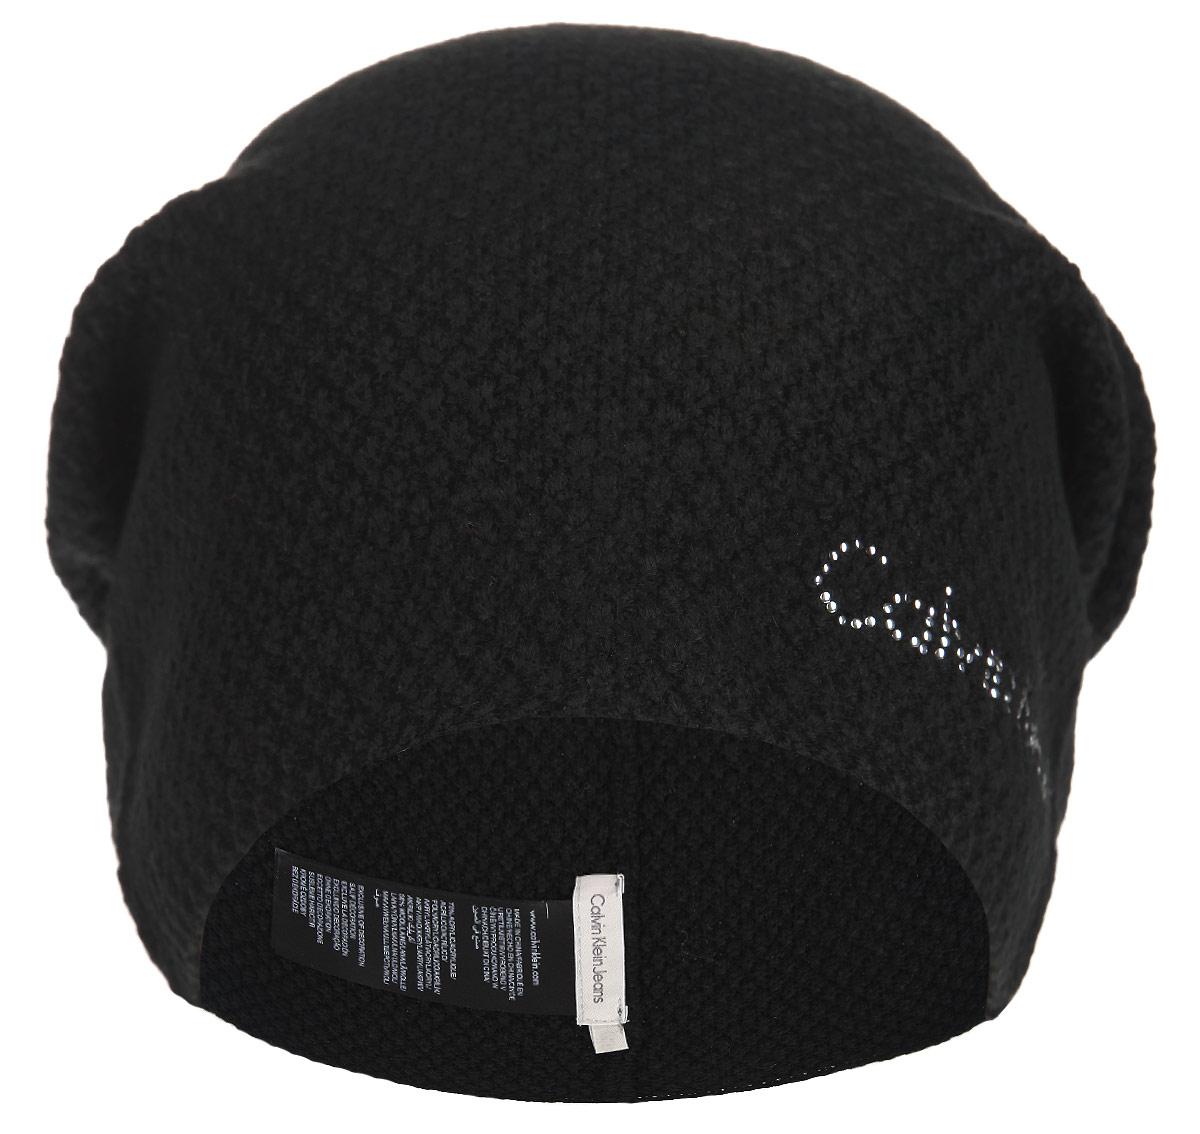 ����� �������. K60K601304 - Calvin Klein JeansK60K601304�������� ������� ����� Calvin Klein Jeans ������� �������� ��� ������������ ����� � ���������� ������. ����� ��������� �� ������������������ ������ � ������, ��� ��������� �� ����������� ��������� ����� � ������������ ��������� �������. ���������� ������ ����� �������� ������� �������� � ��������� ������. ����� ����� ������ ������ ����������� ������ ���������, � ����� ������� ��� �������� ����� � ��������.